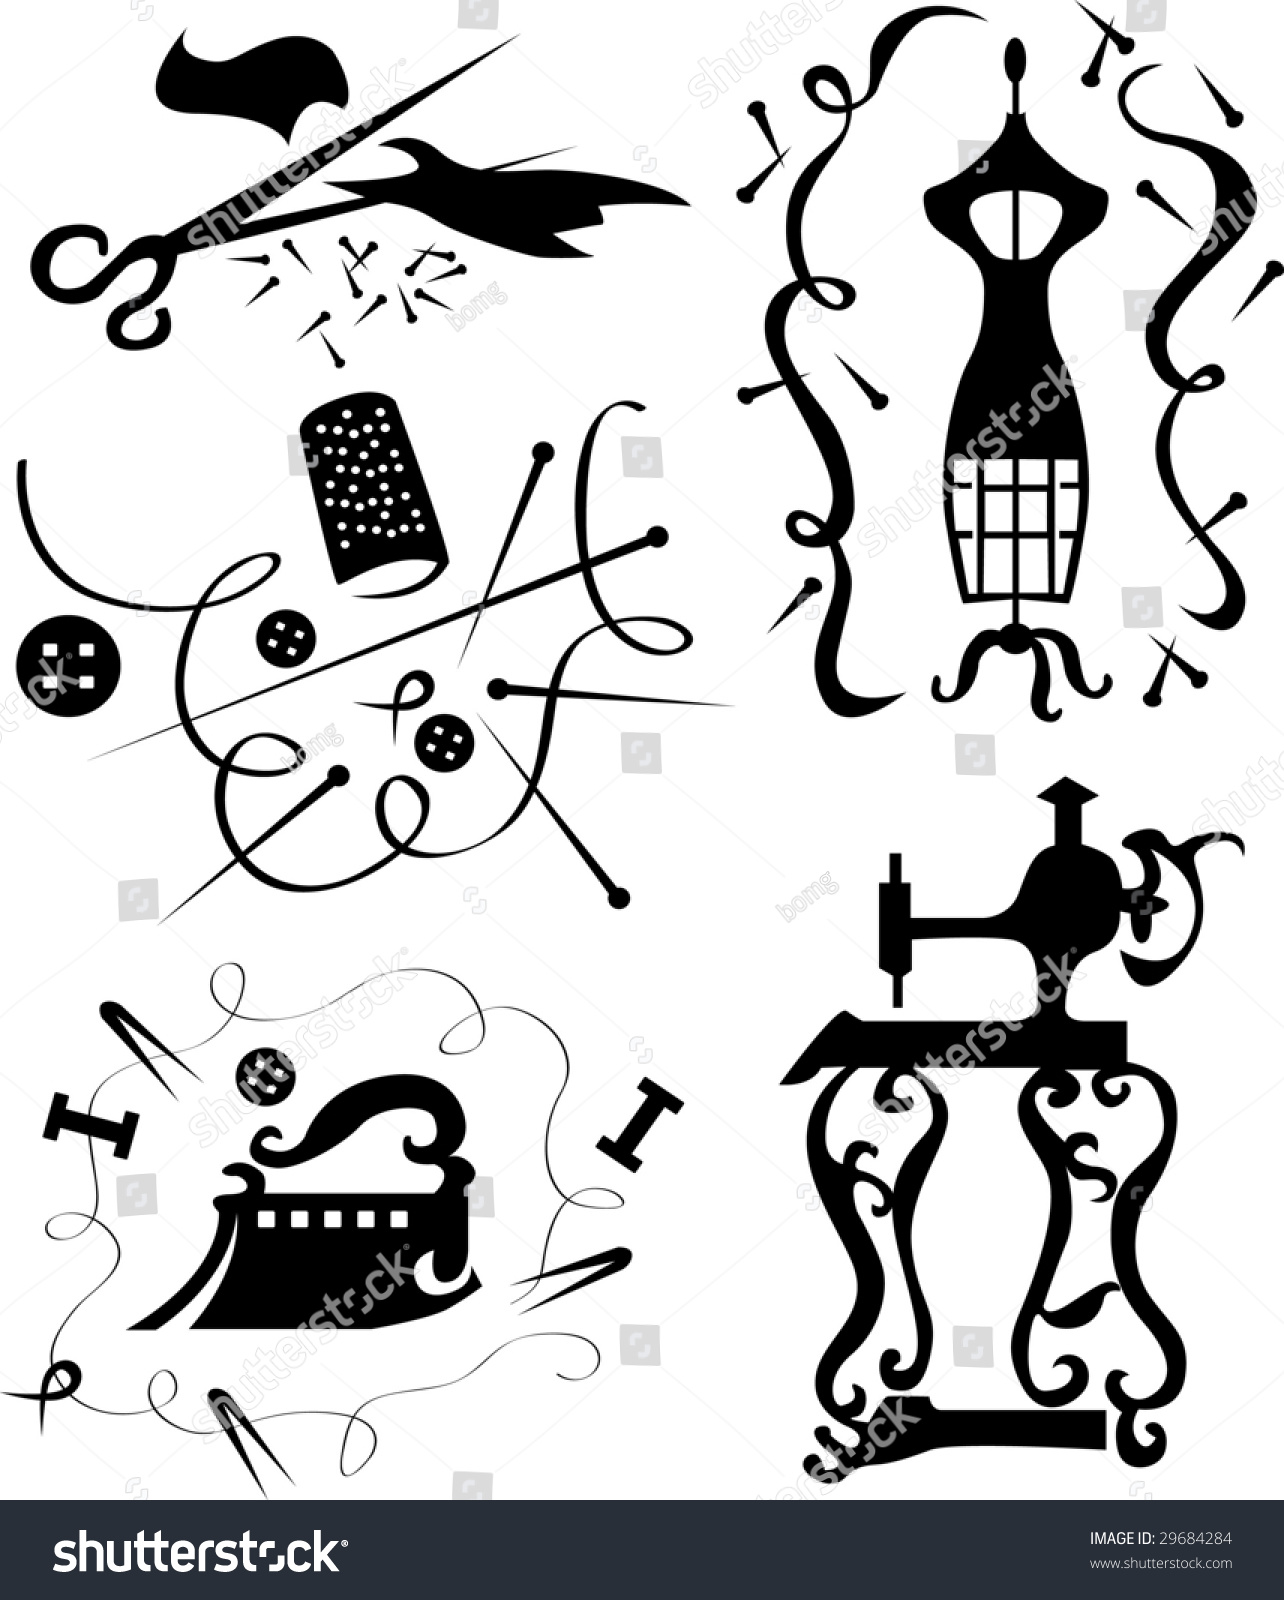 Set Of Decorative Elements Of The Fashion Designer Of